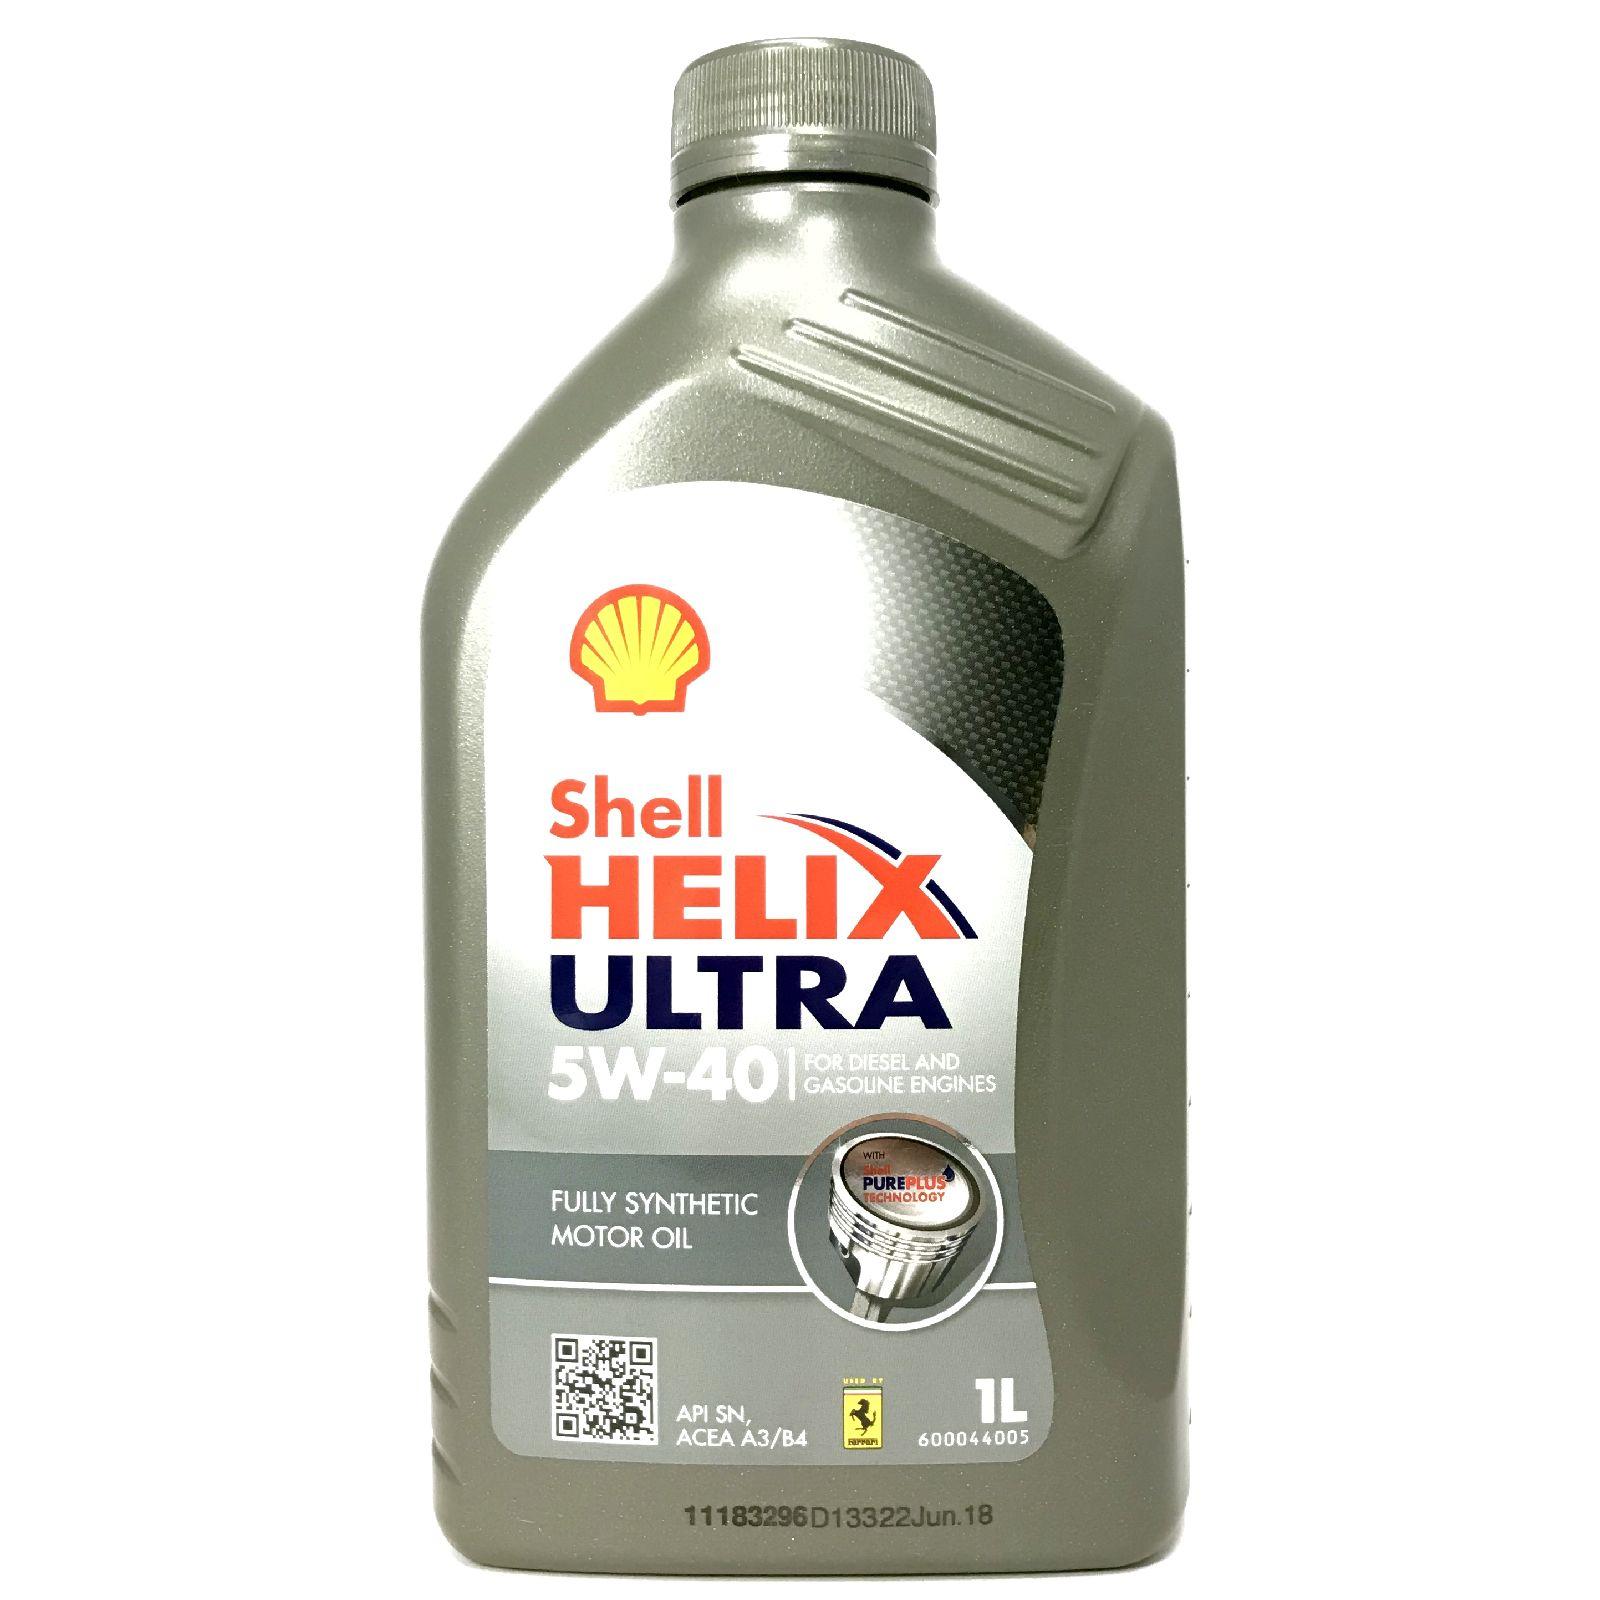 1 Liter Shell Helix Ultra 5W-40